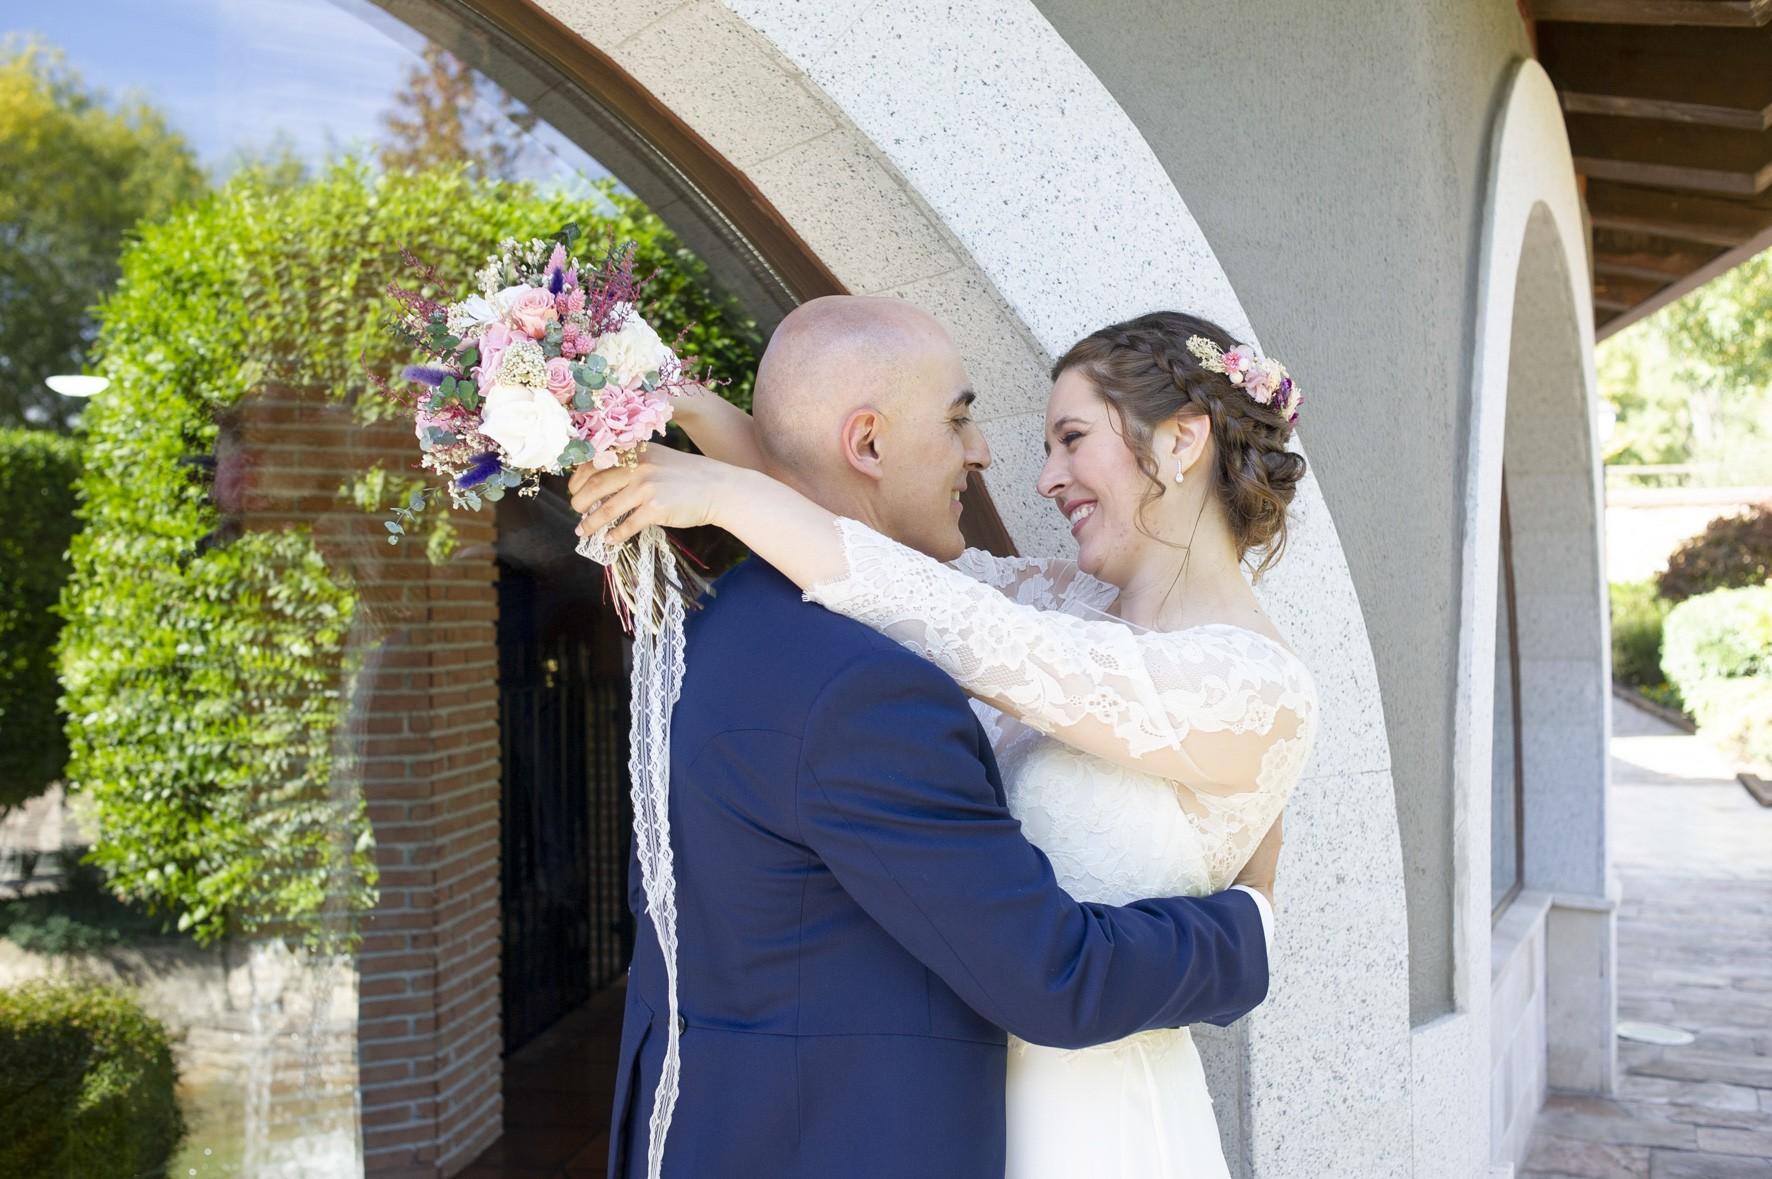 fotografos de boda hacienda jacaranda_05